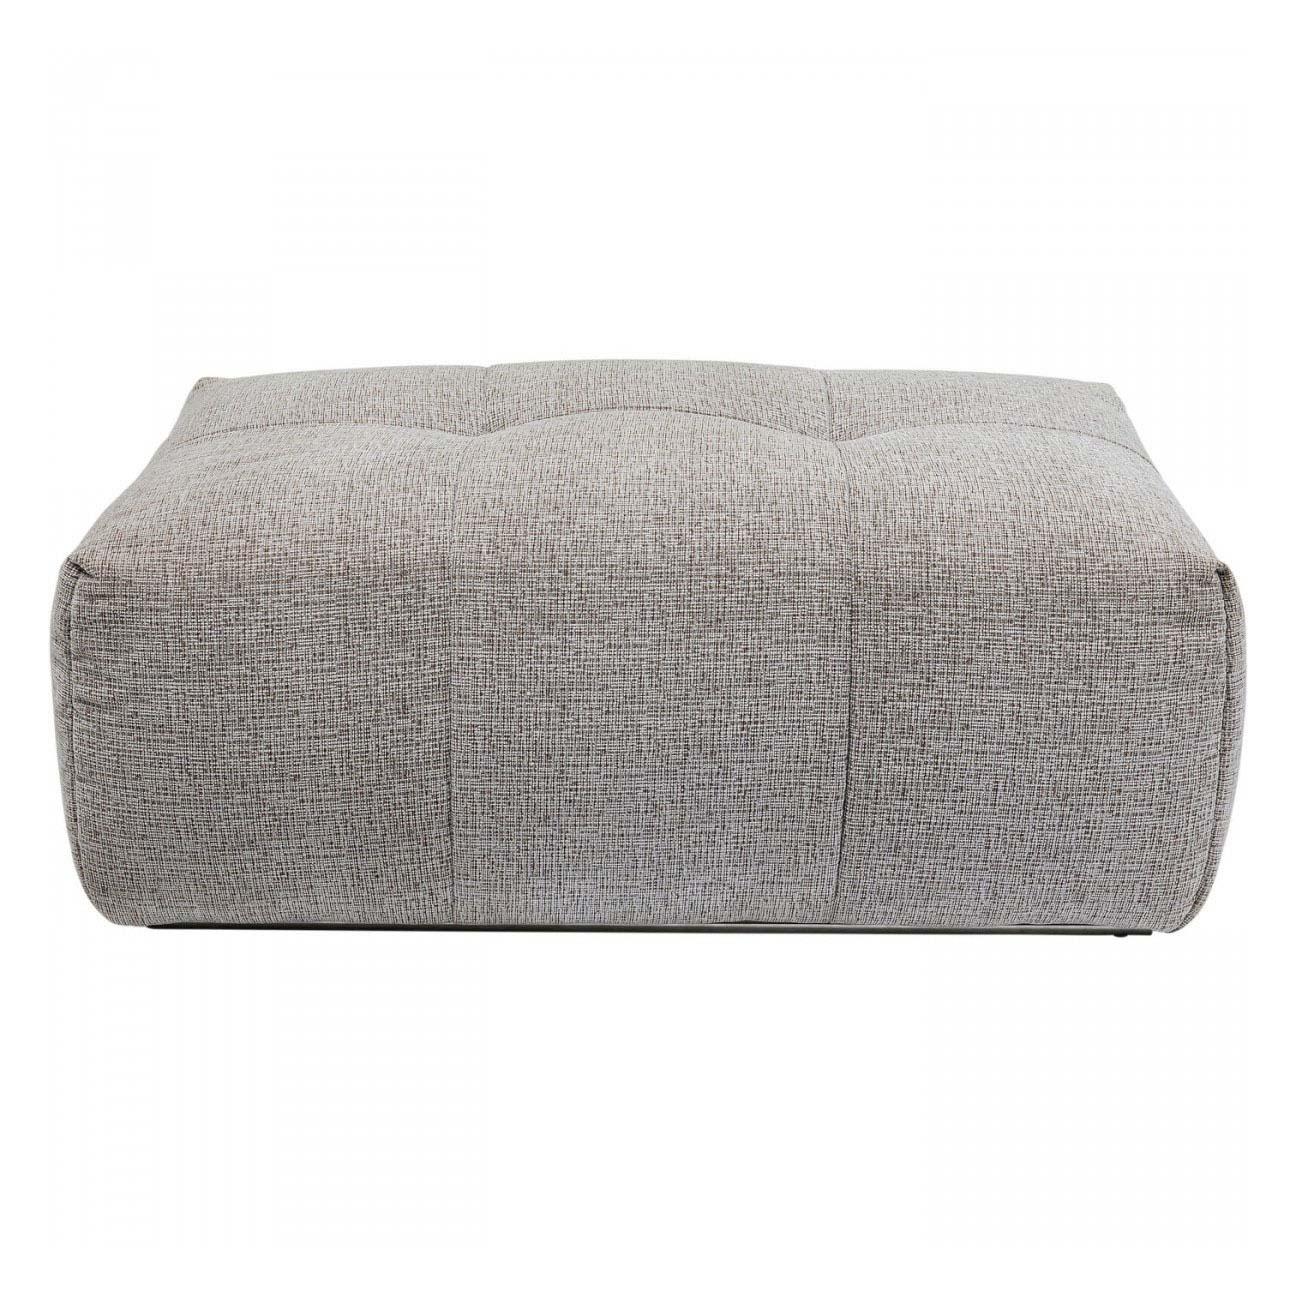 KARE DESIGN rektangulær Studio puf - polyester og stål (114x75)